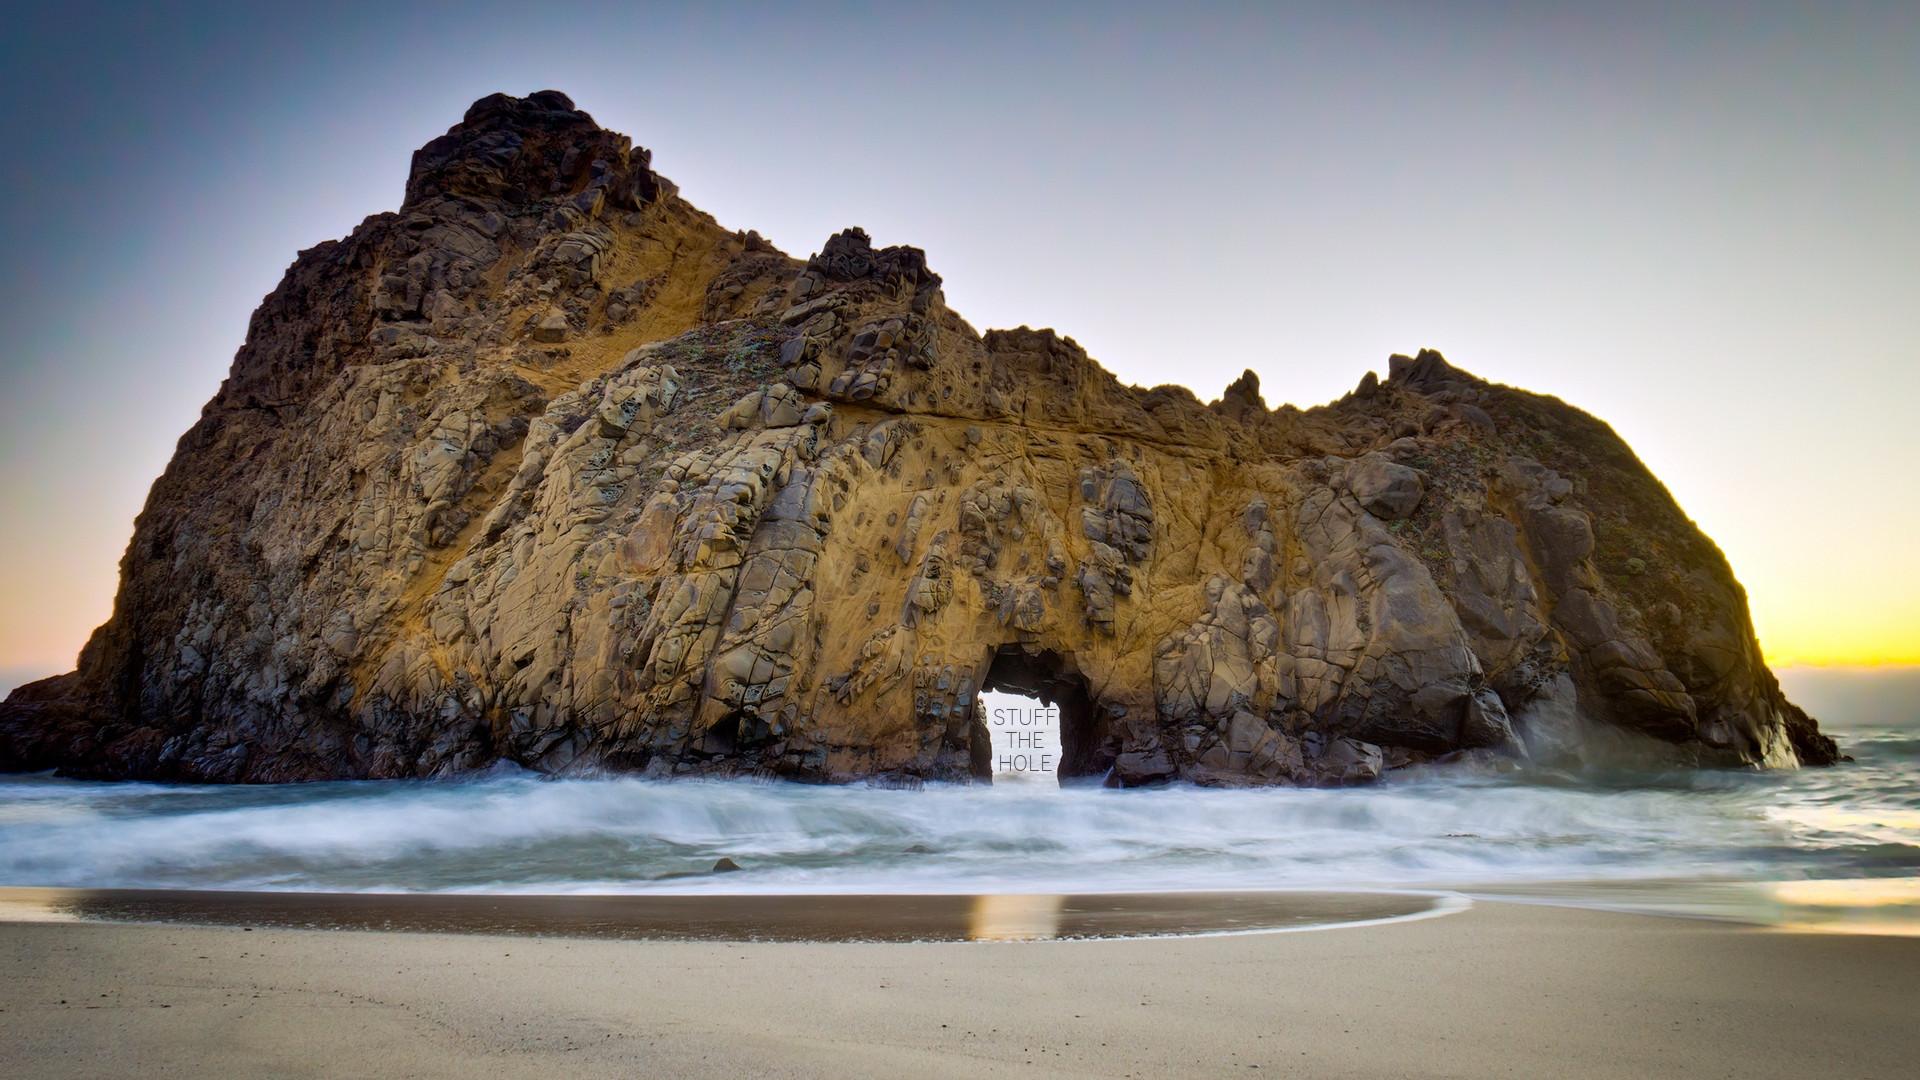 Explore Beach Wallpaper, Hd Wallpaper, and more!